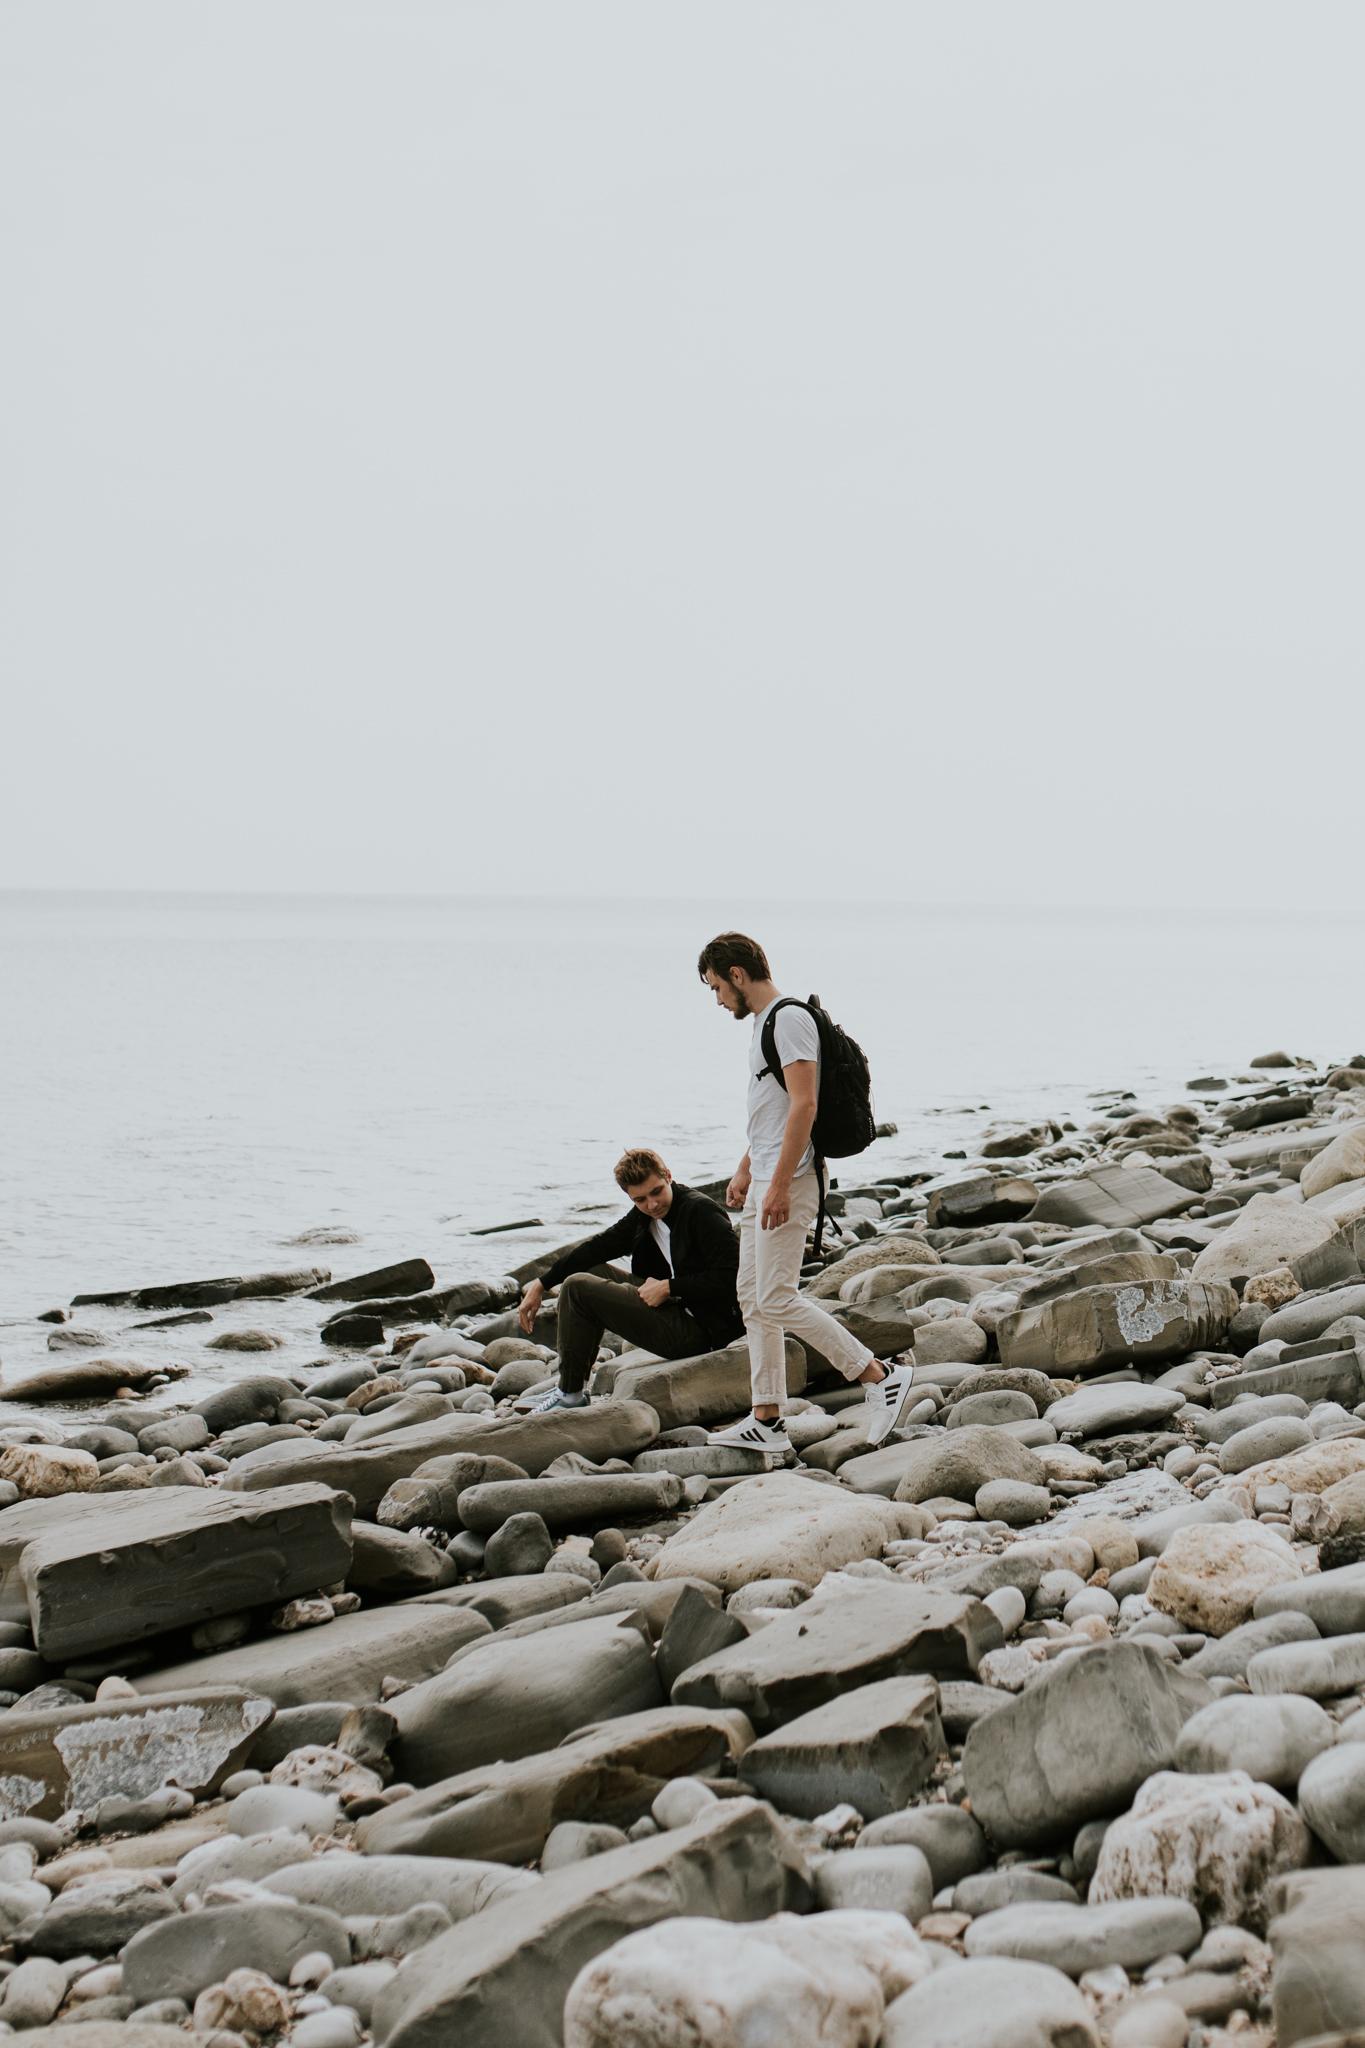 Natalie Skoric - England Travel Photography (130).jpg